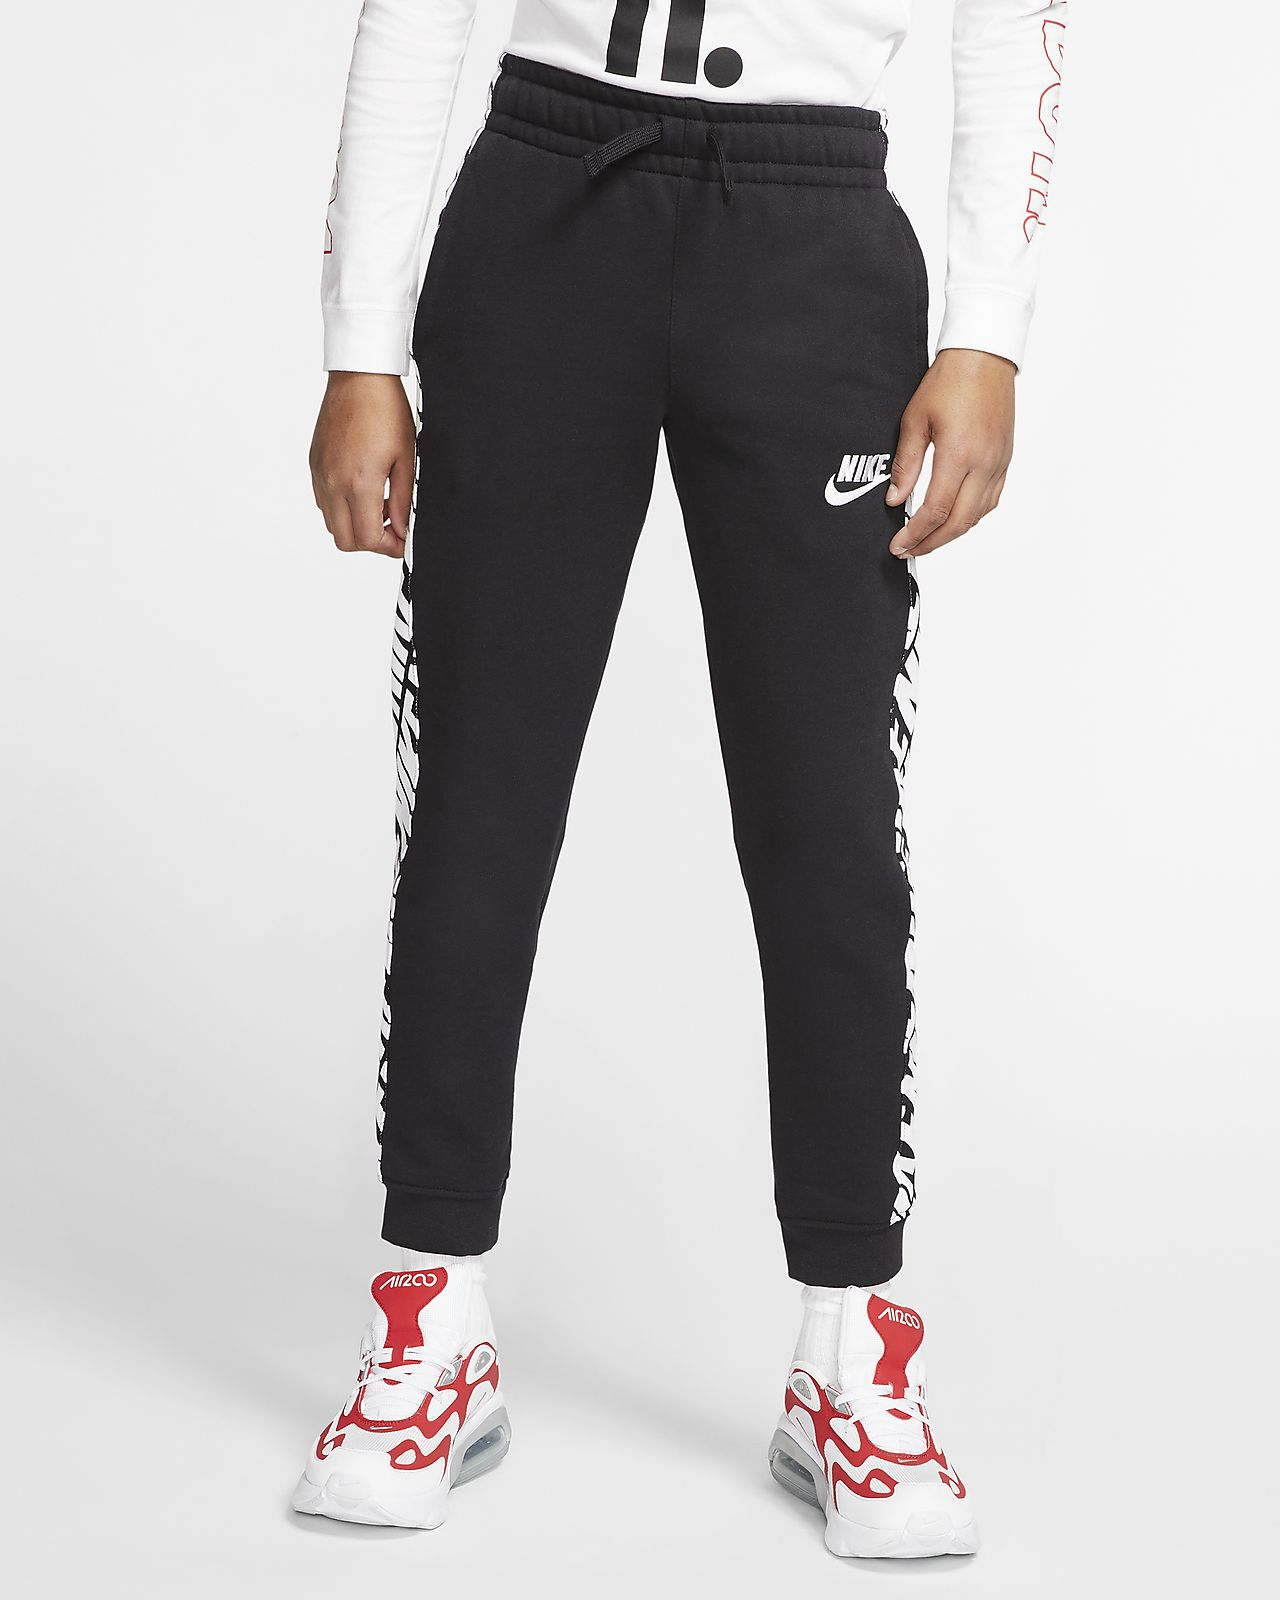 Pantalones de French Terry para niño talla grande Nike Sportswear